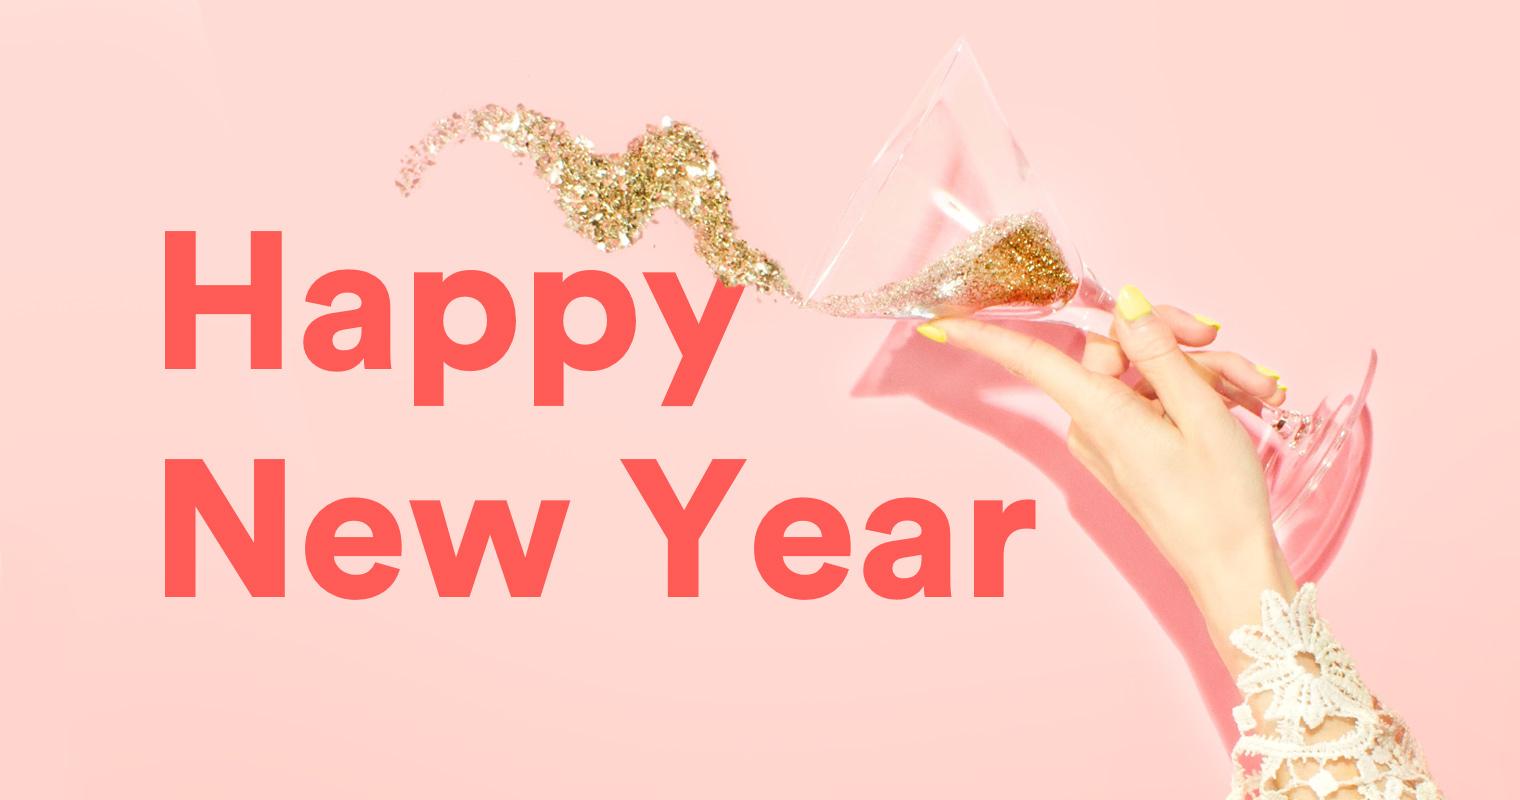 New Year's Resolution: Γιατί παίρνεις τις ίδιες αποφάσεις κάθε χρόνο